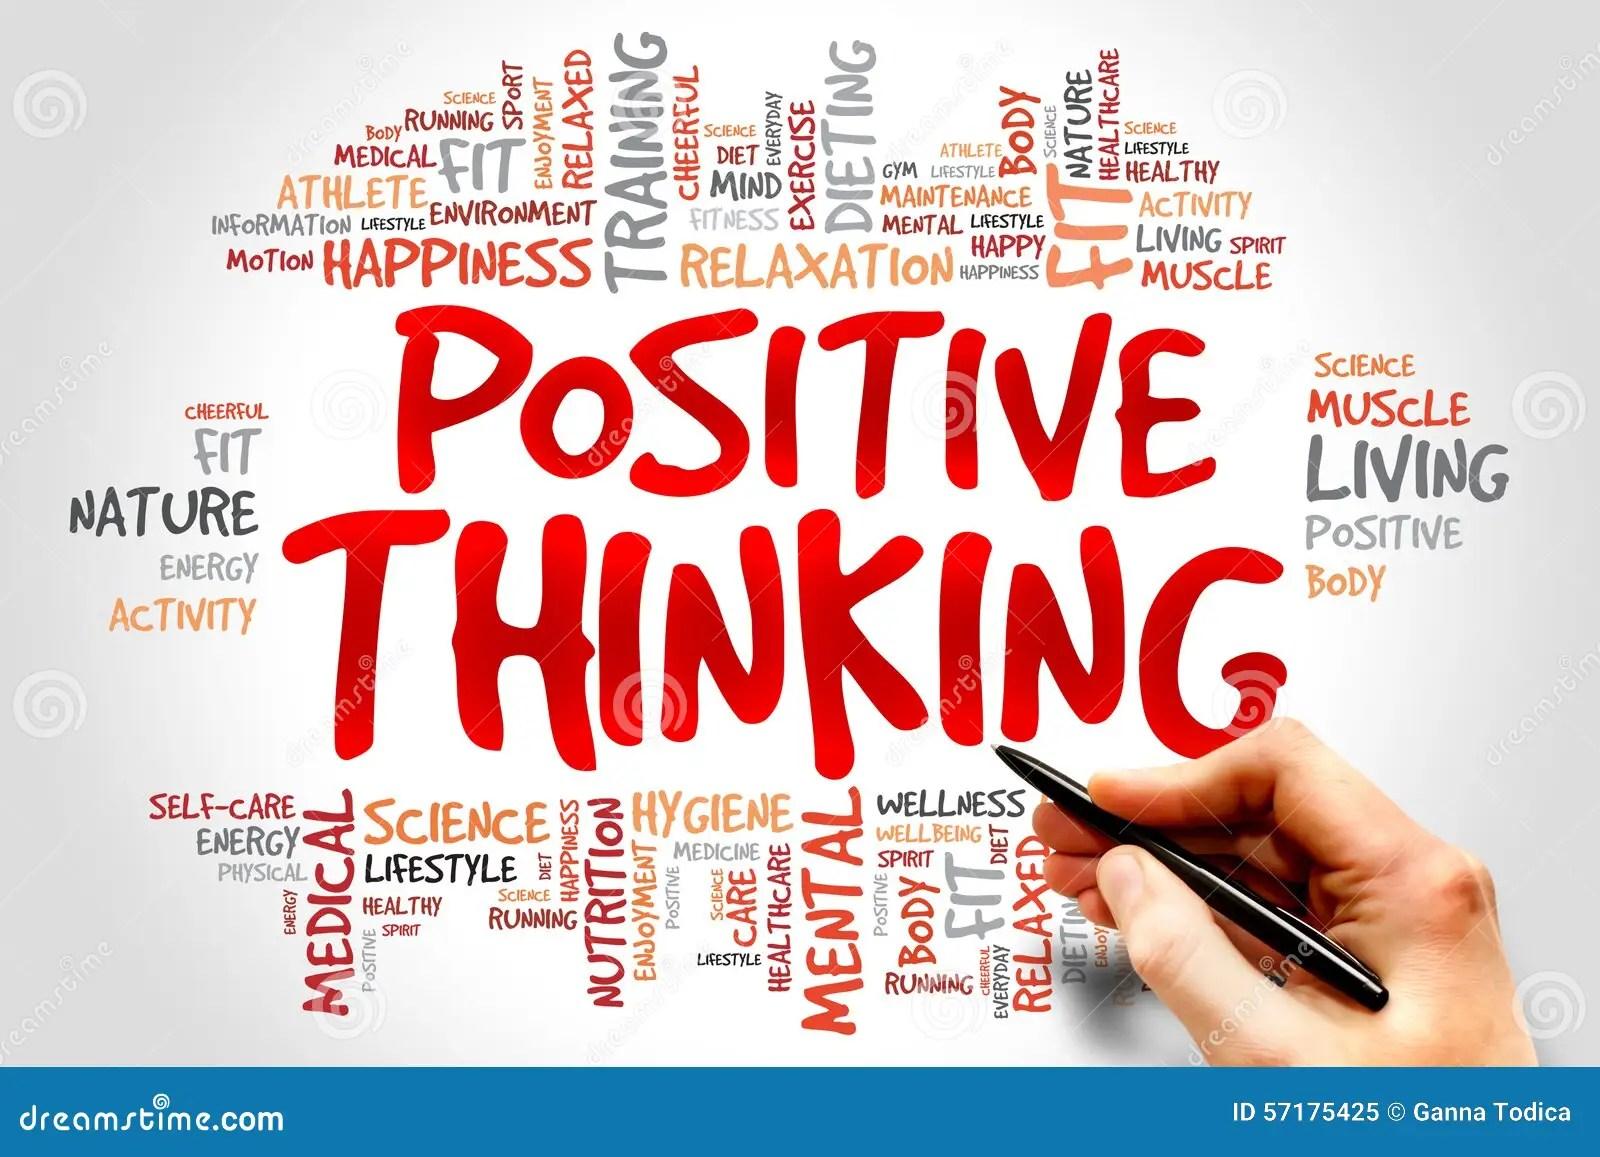 Positive Thinking Stock Image Image Of Hand Activity